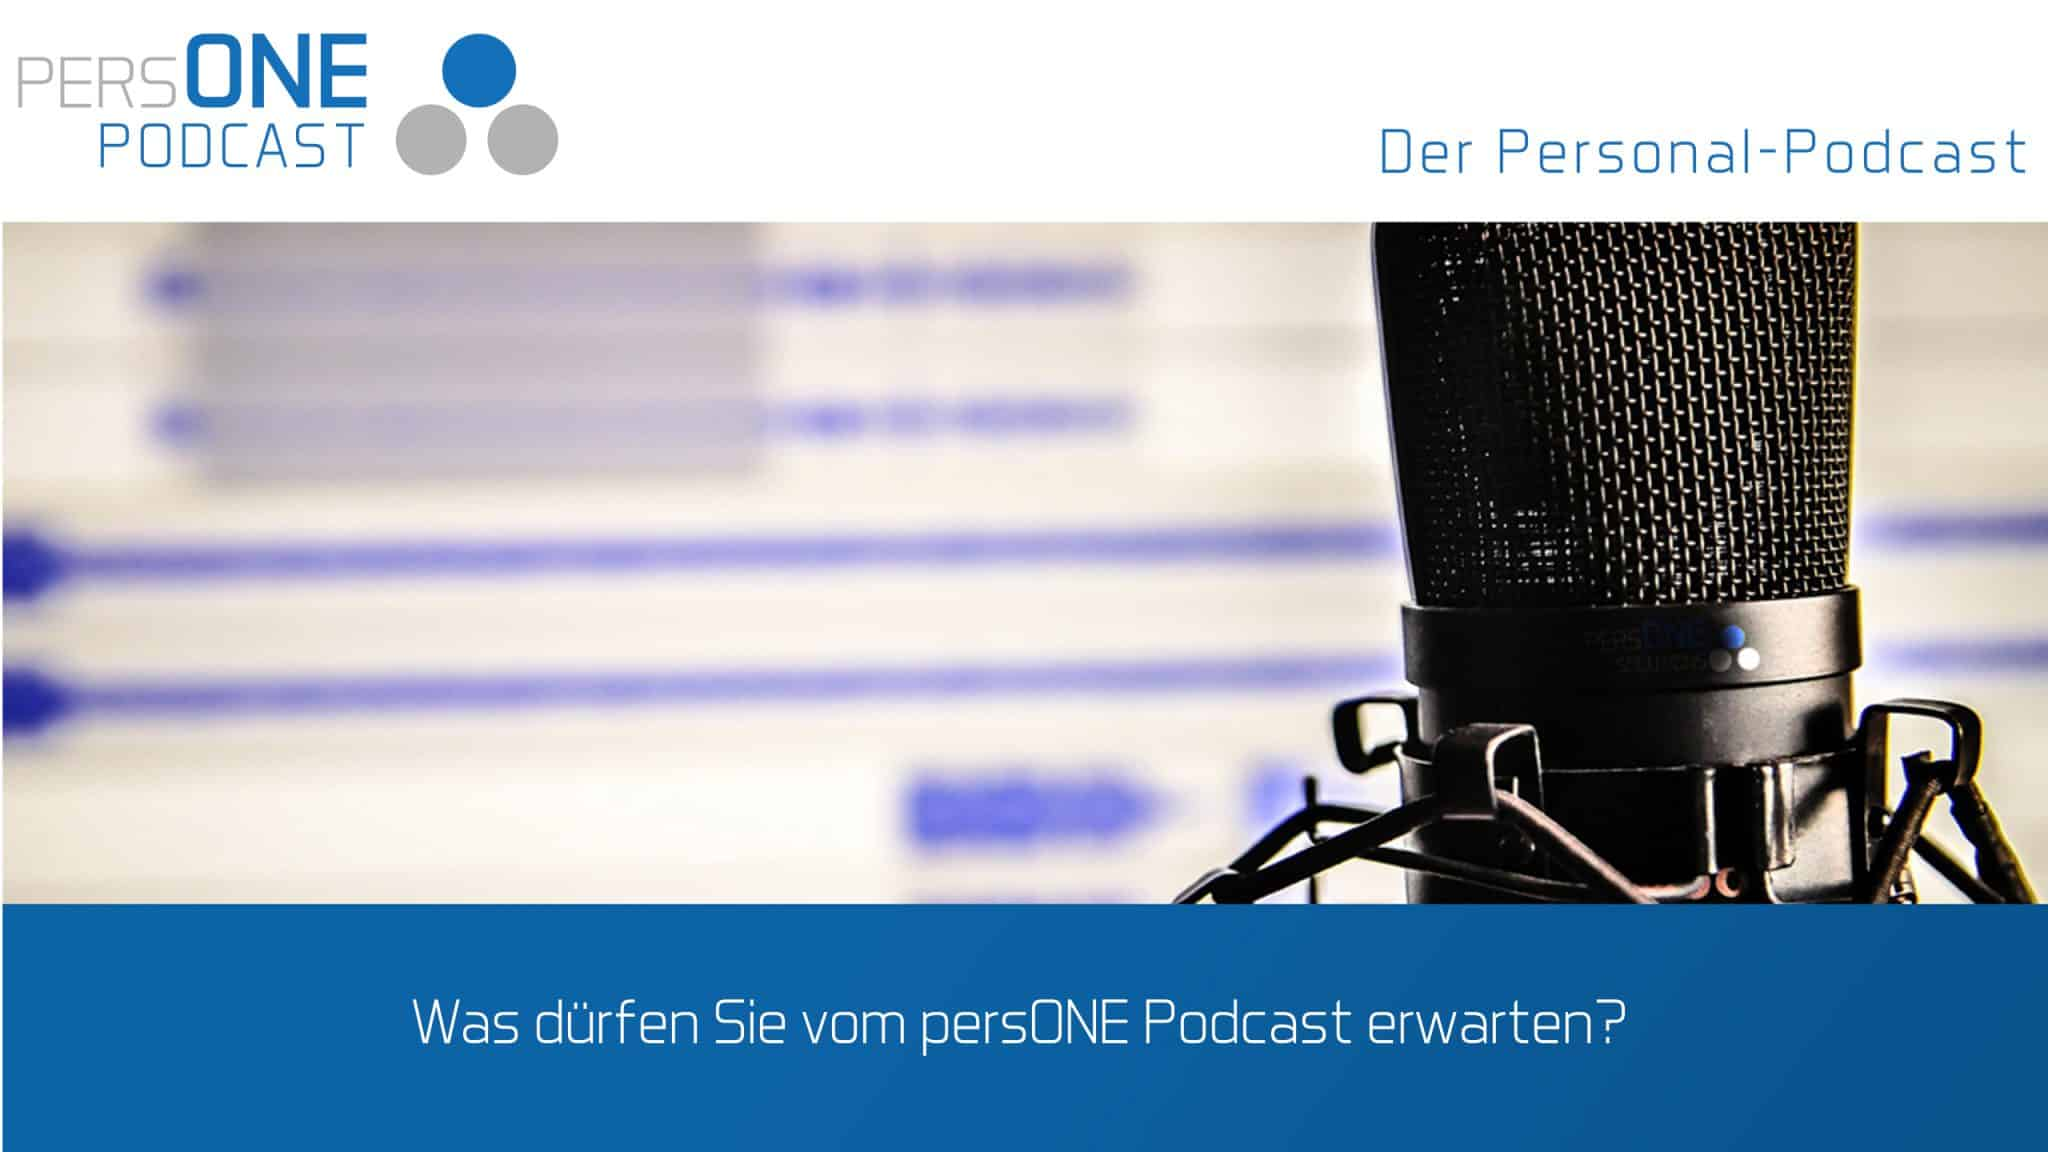 persONE Podcast